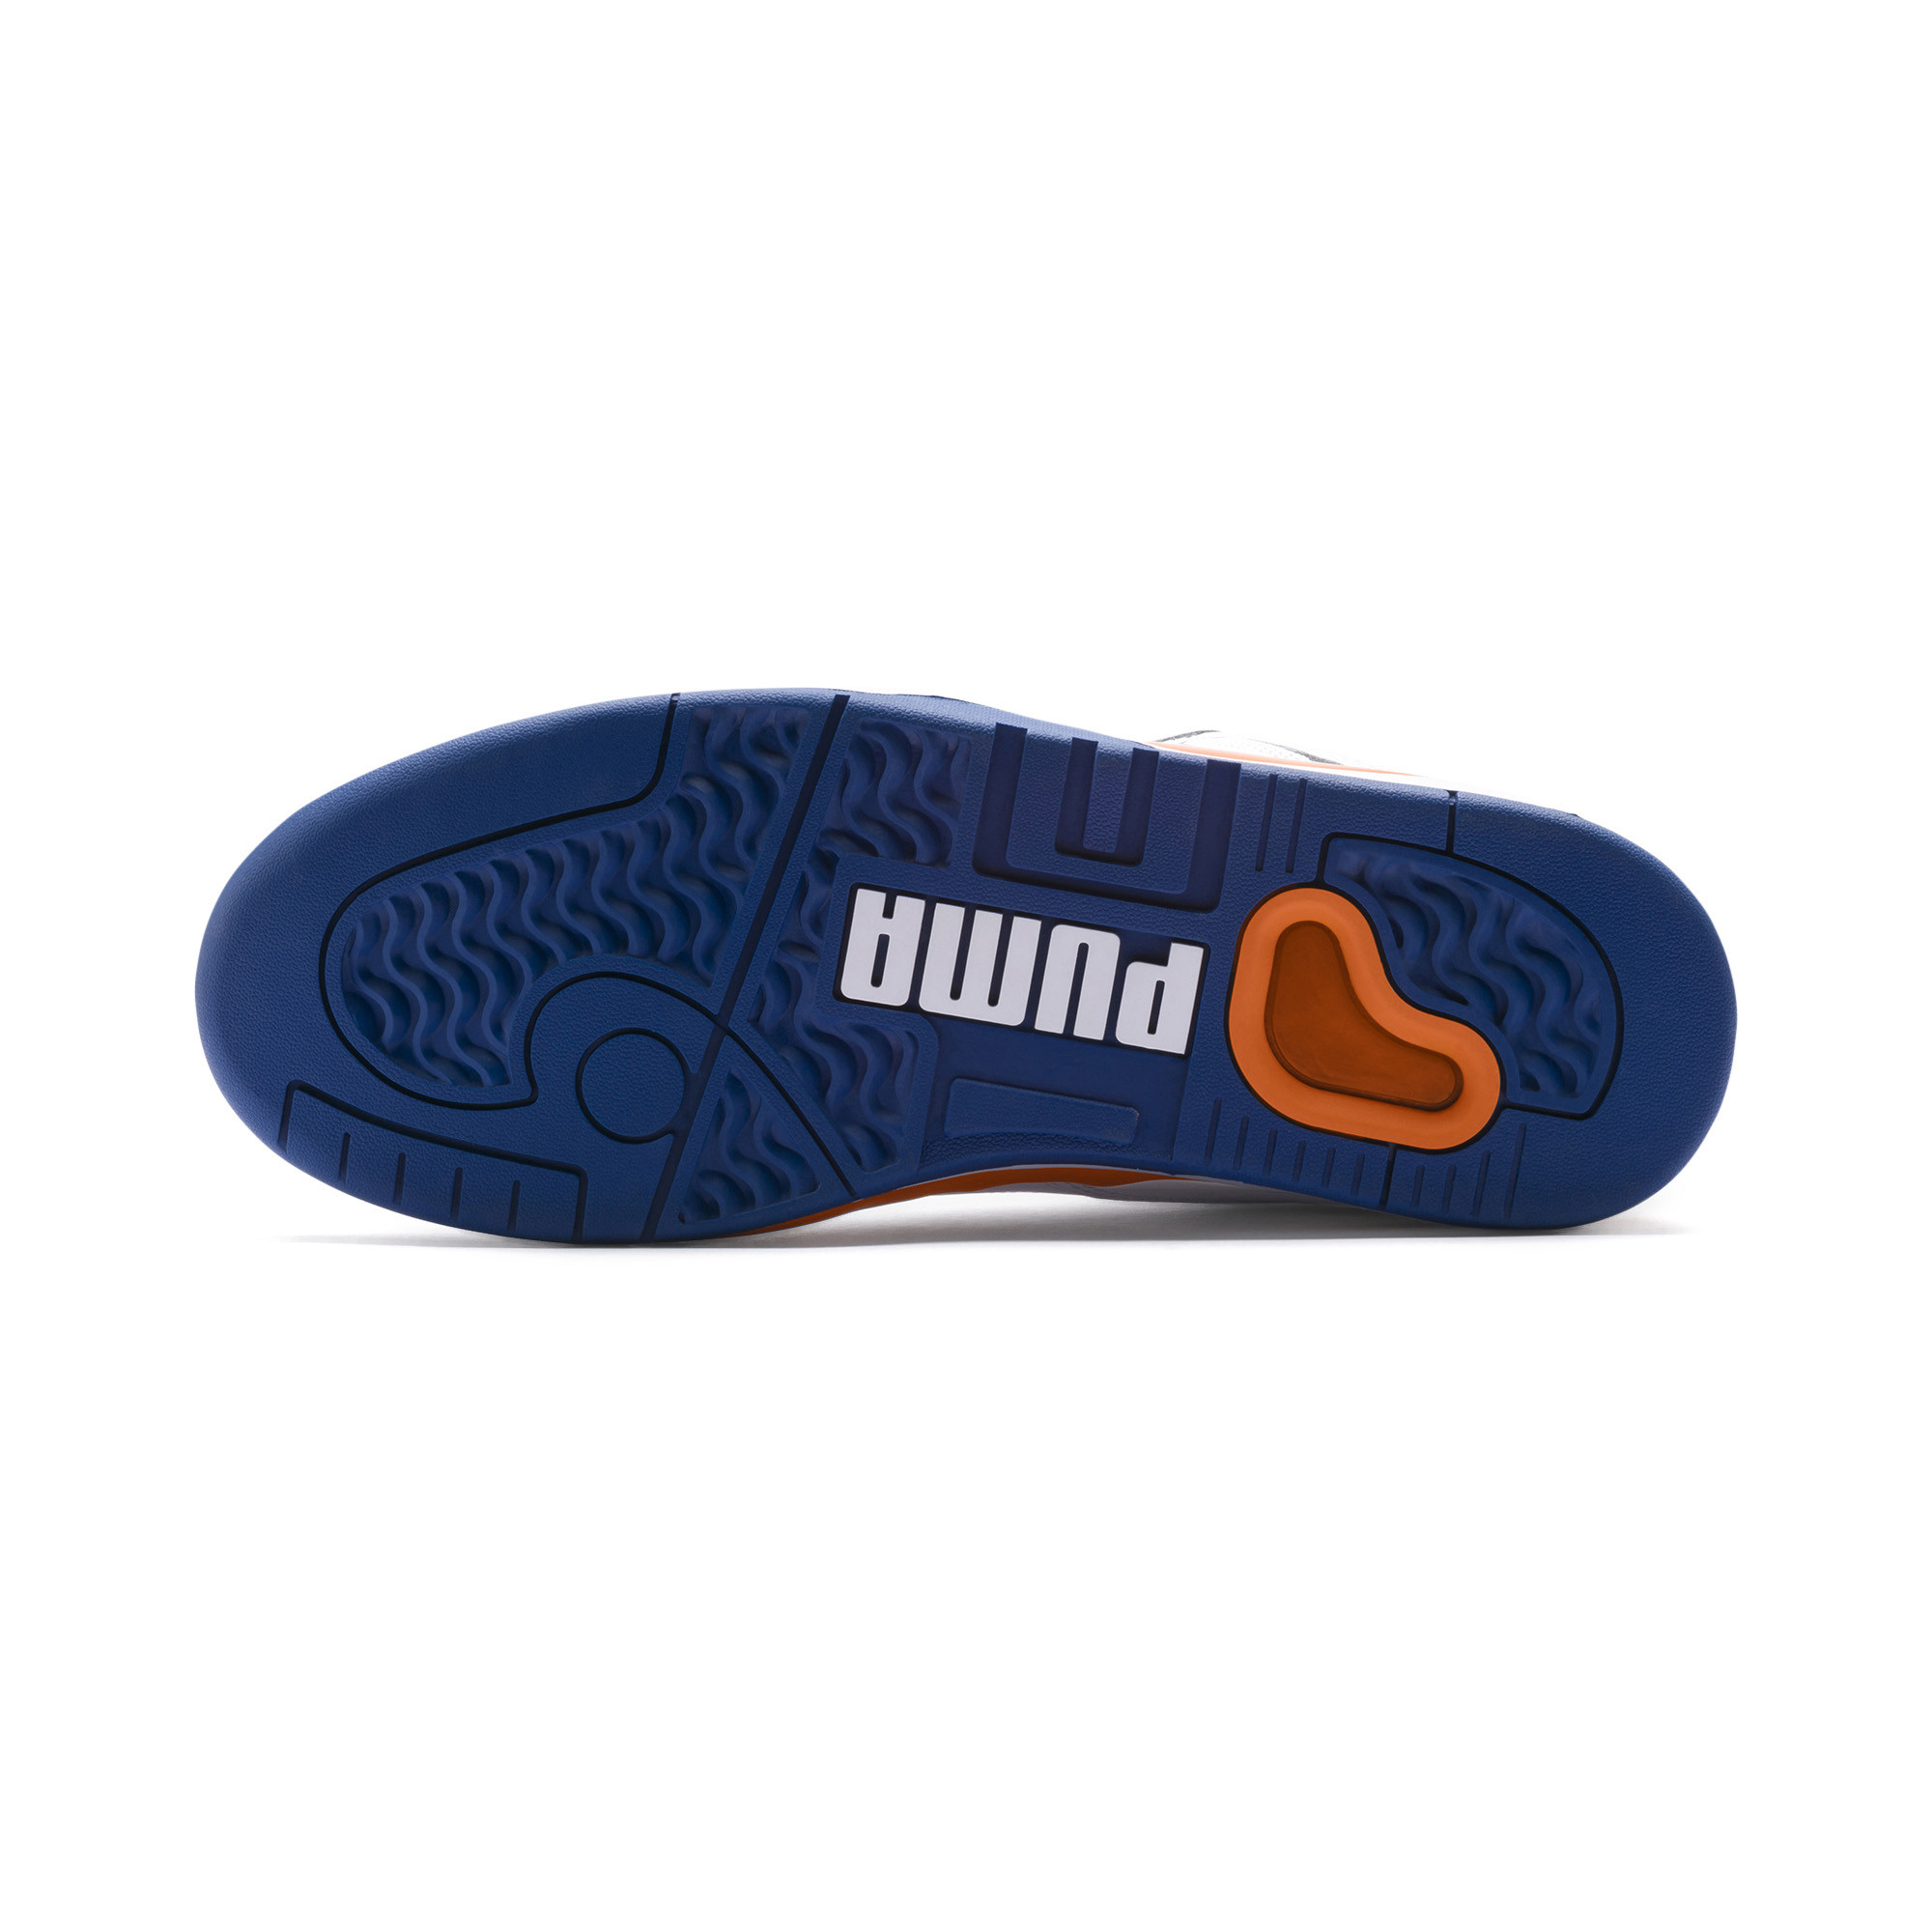 Indexbild 32 - PUMA Palace Guard Sneaker Unisex Schuhe Sport Classics Neu